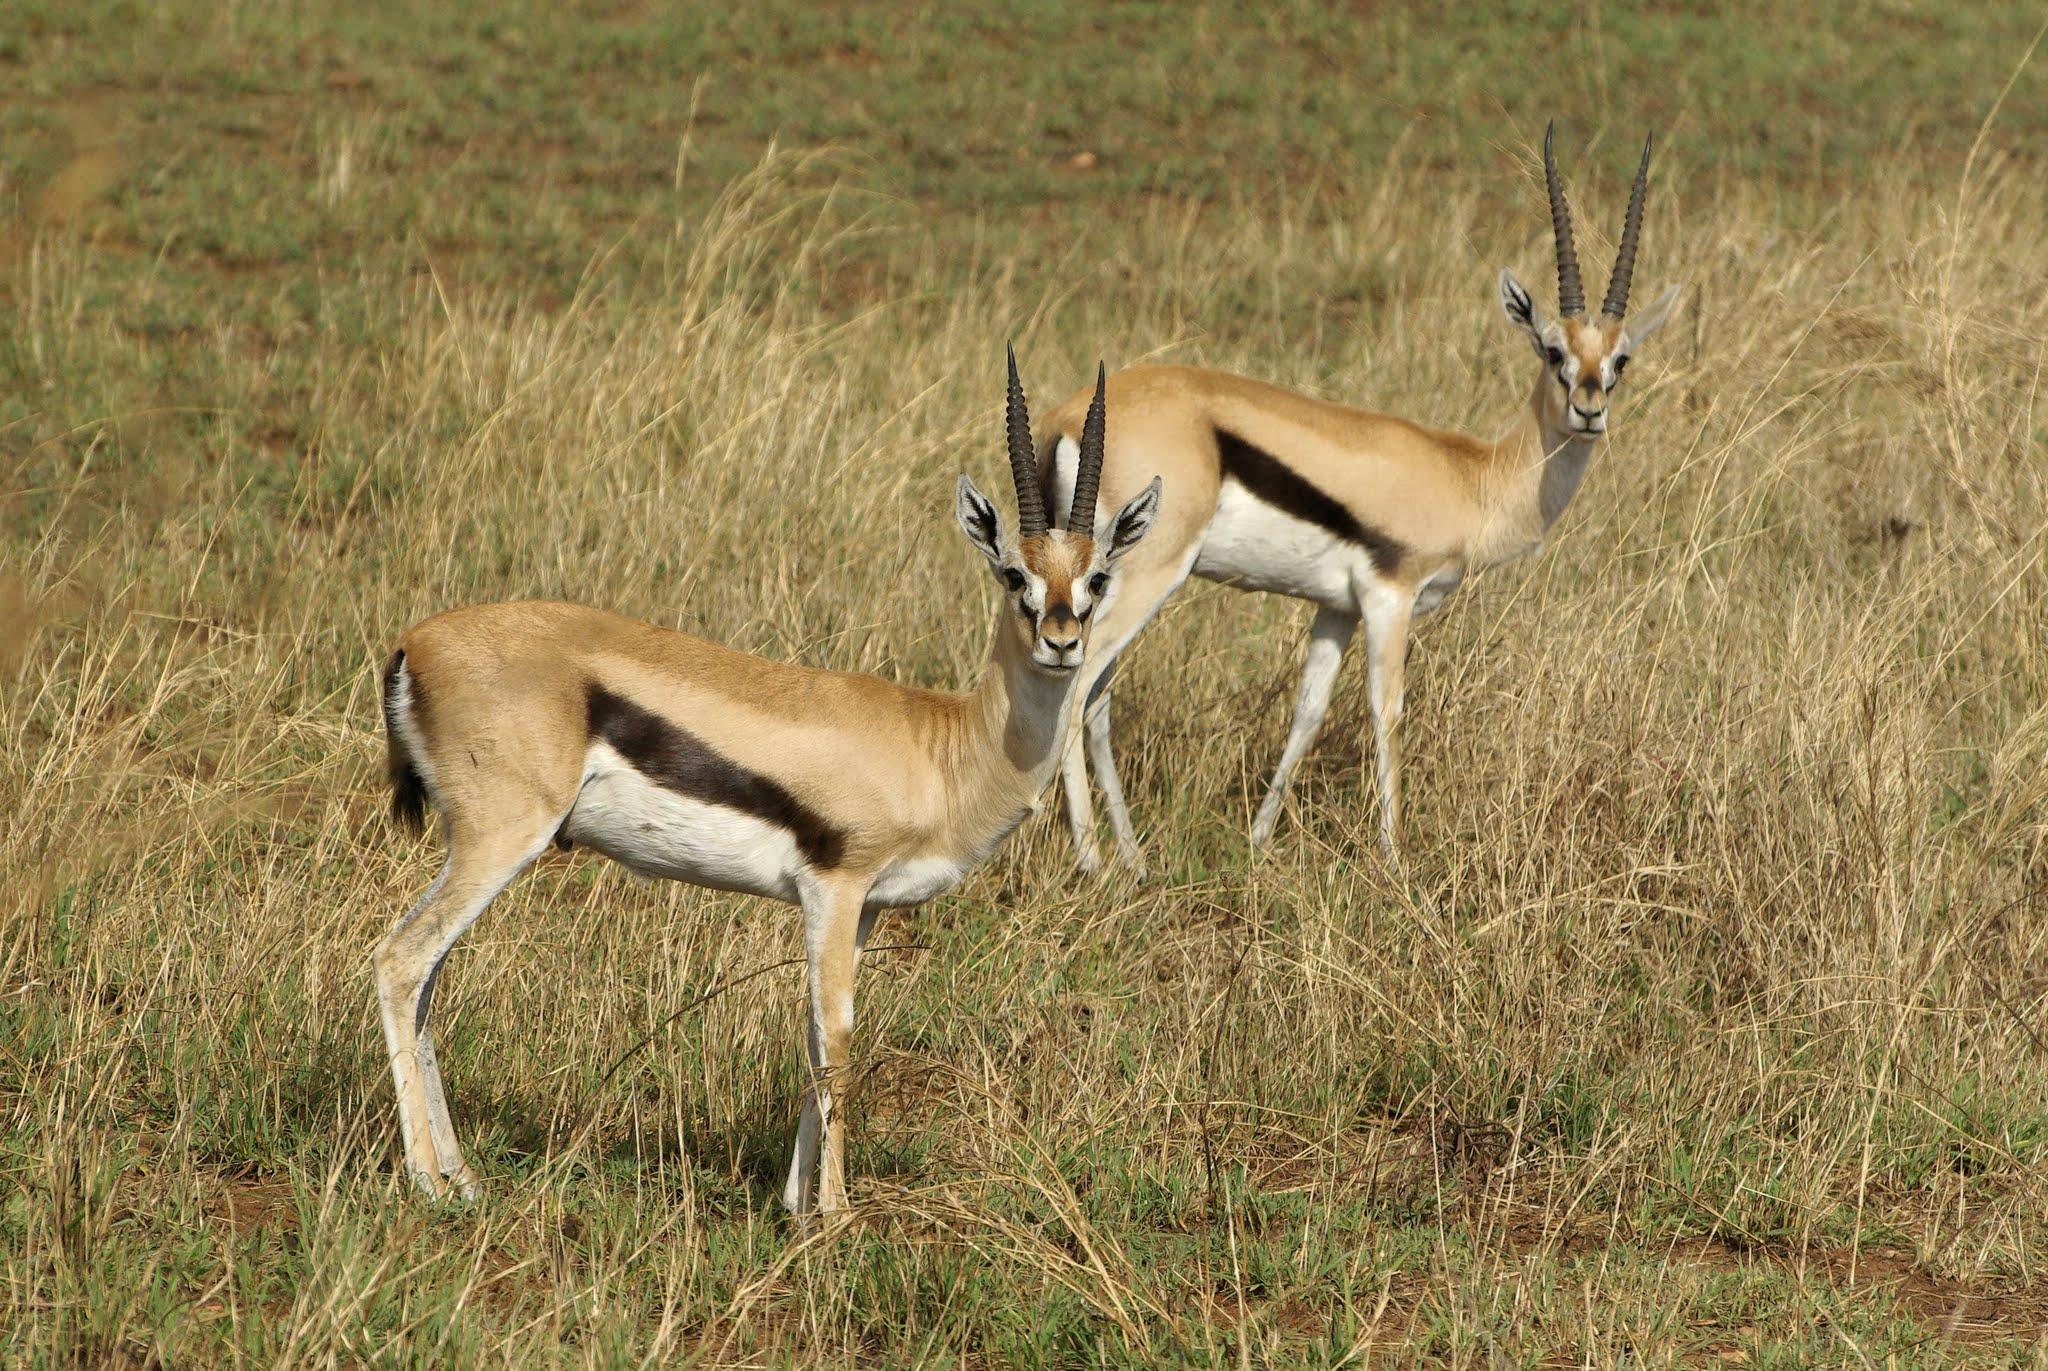 gazelle-de-thompson1-serengeti-06-08_dxo